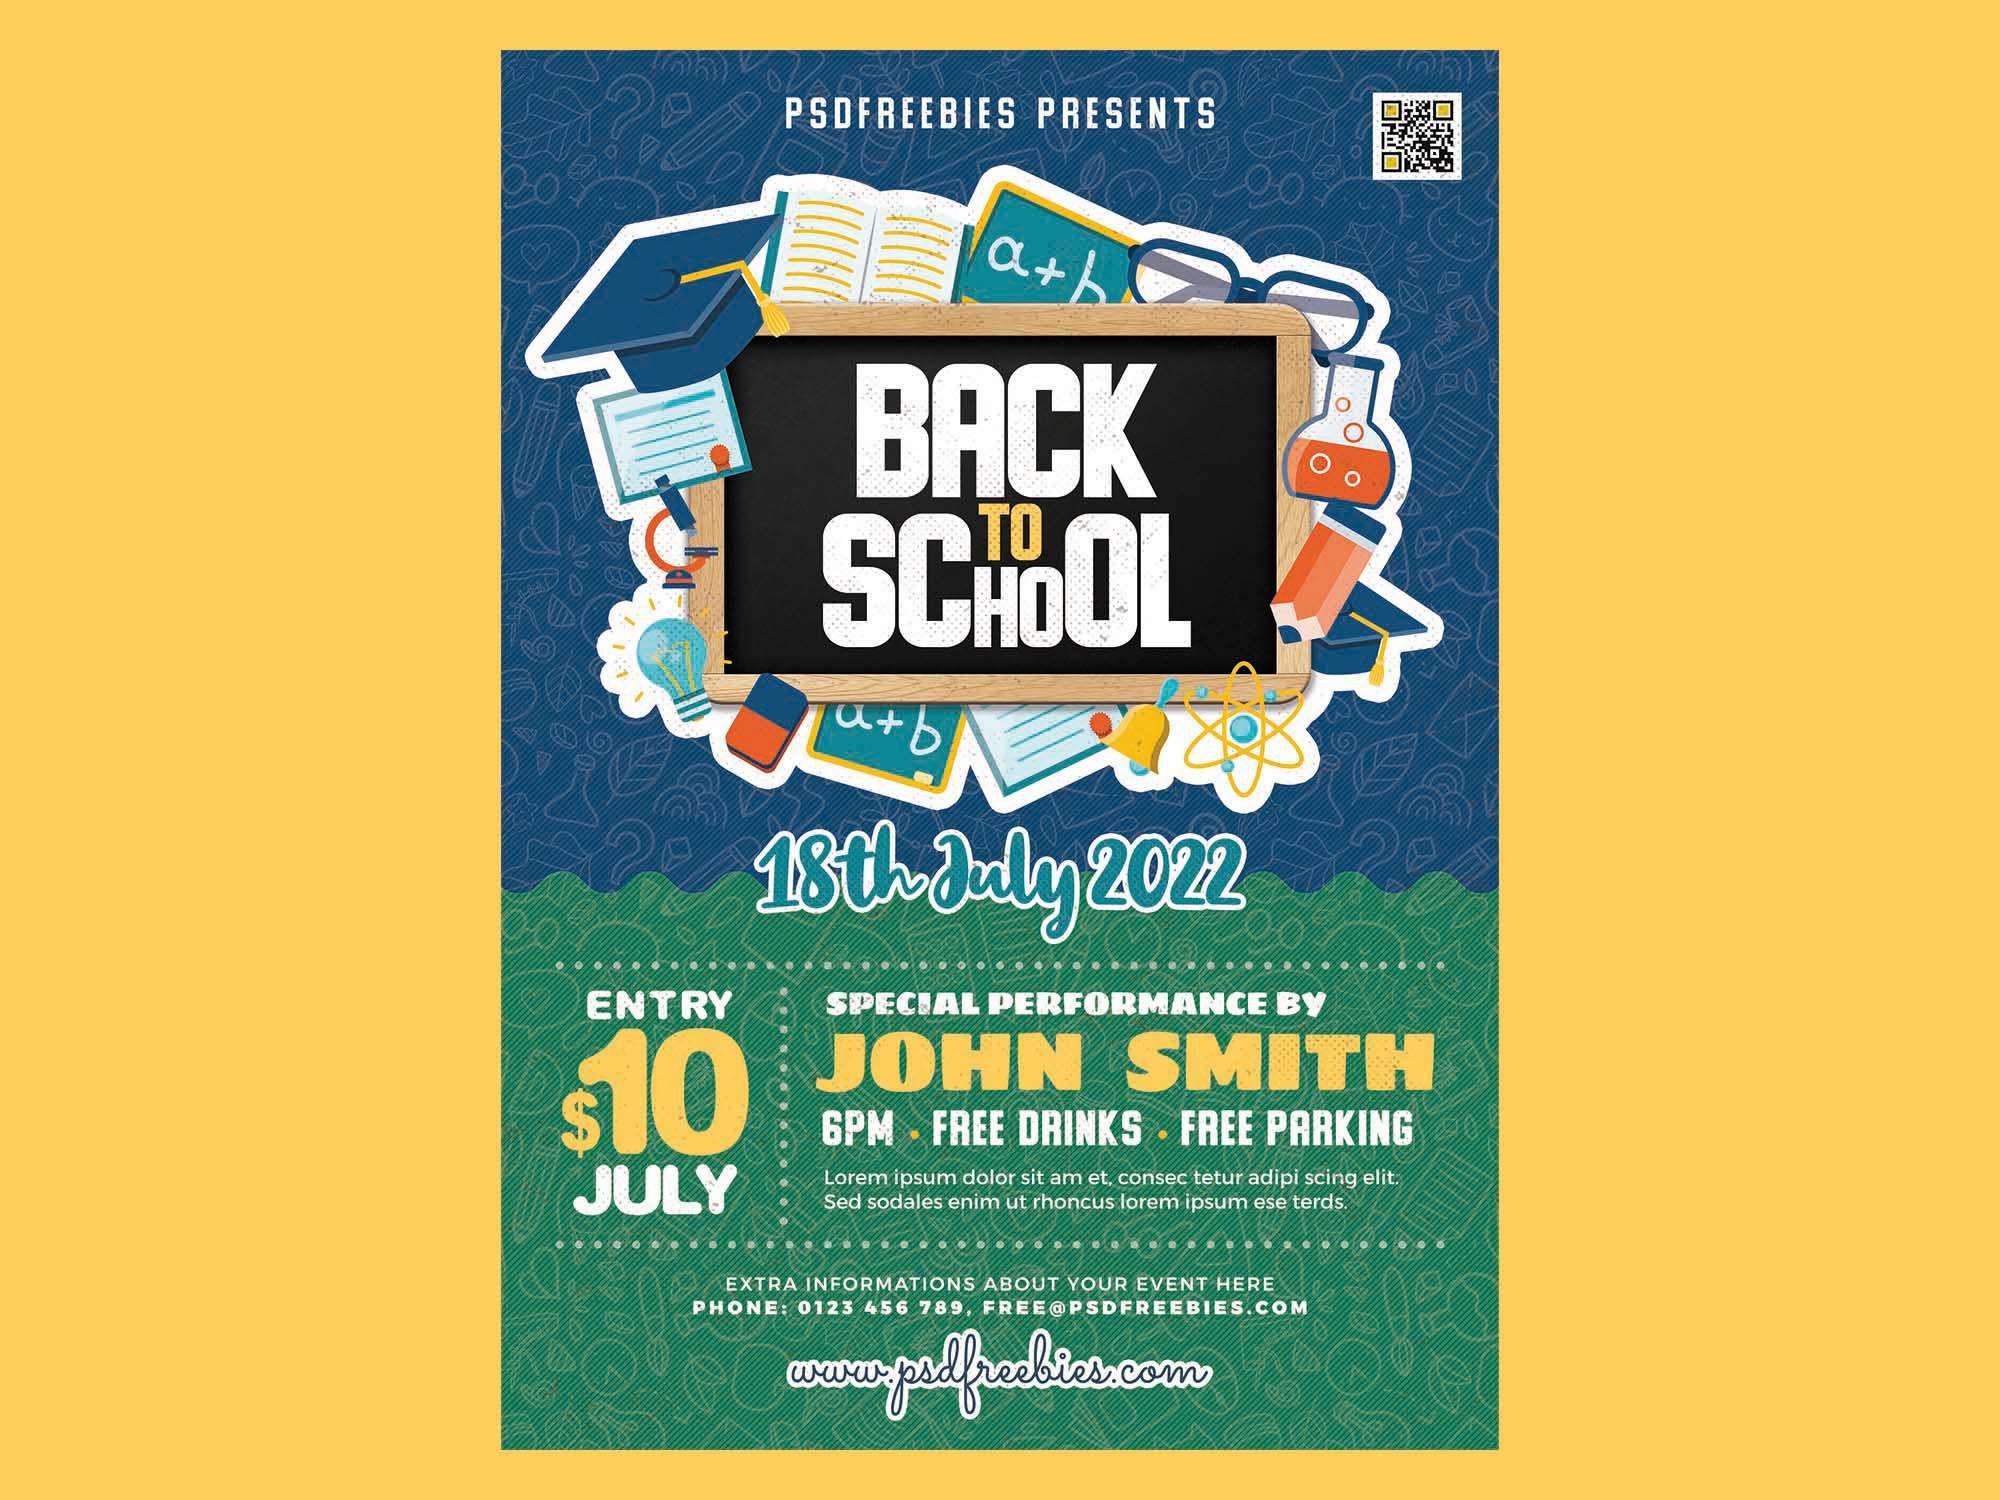 004 Surprising Free School Flyer Design Template Inspiration  Templates Creative Education PosterFull